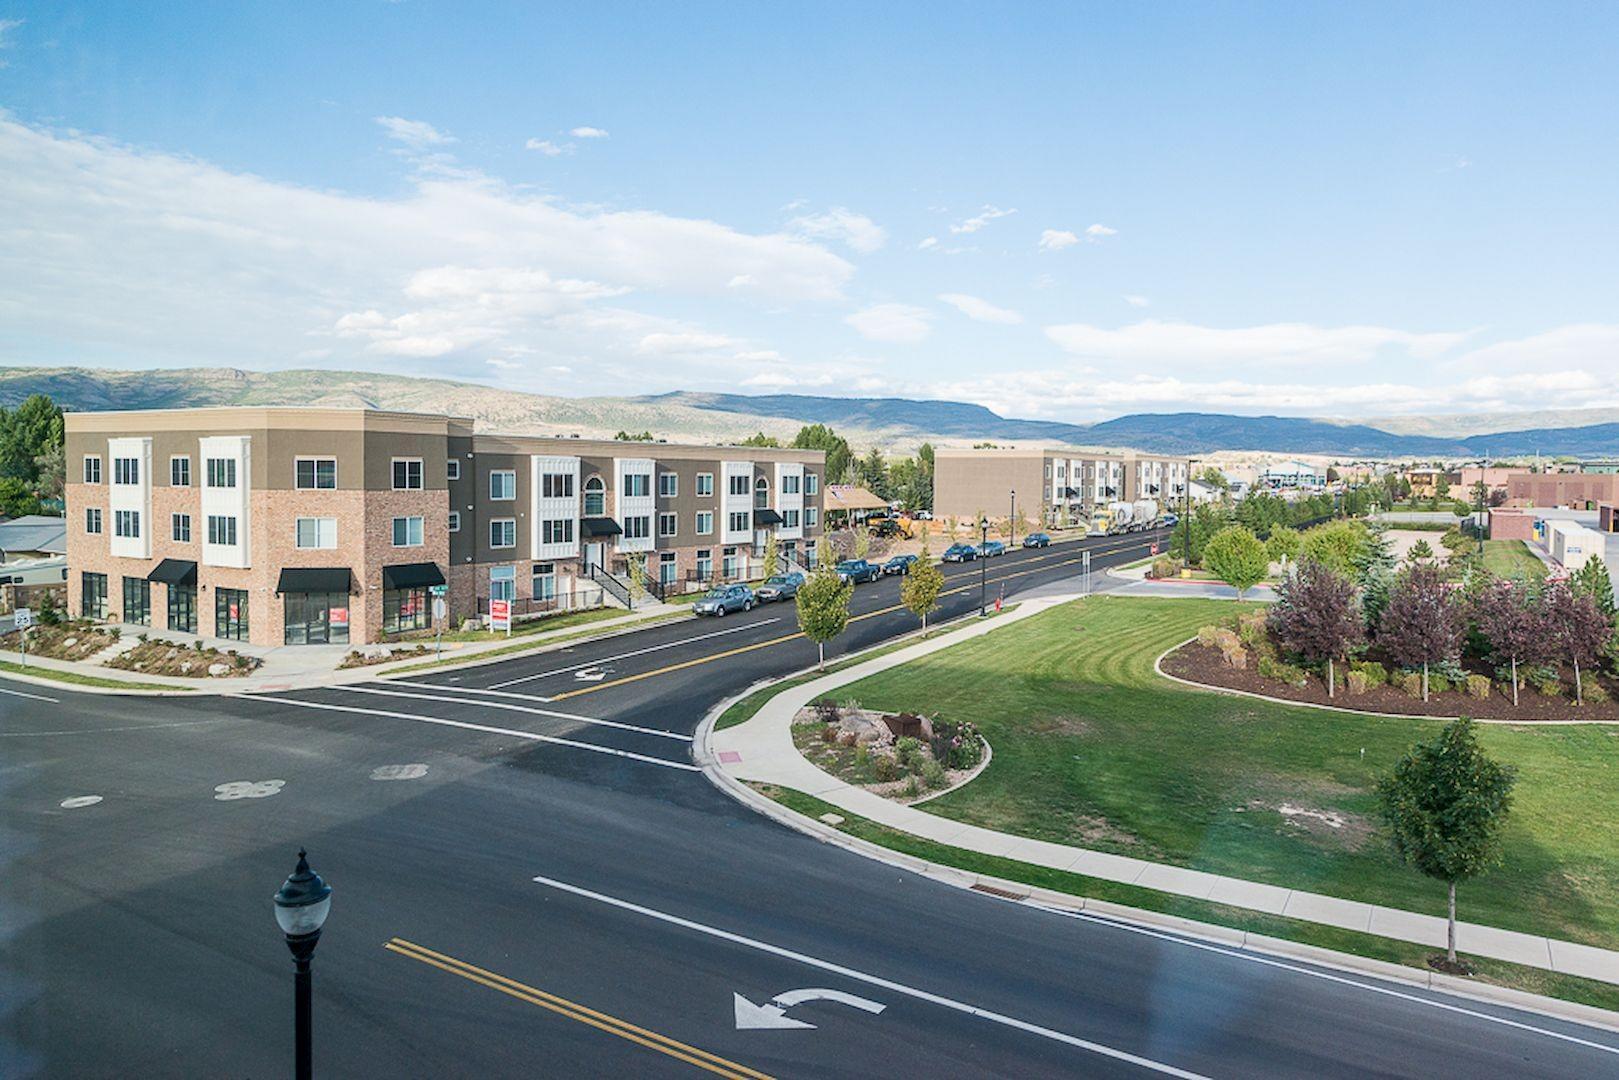 FIG's new fourplex development in Heber, Utah